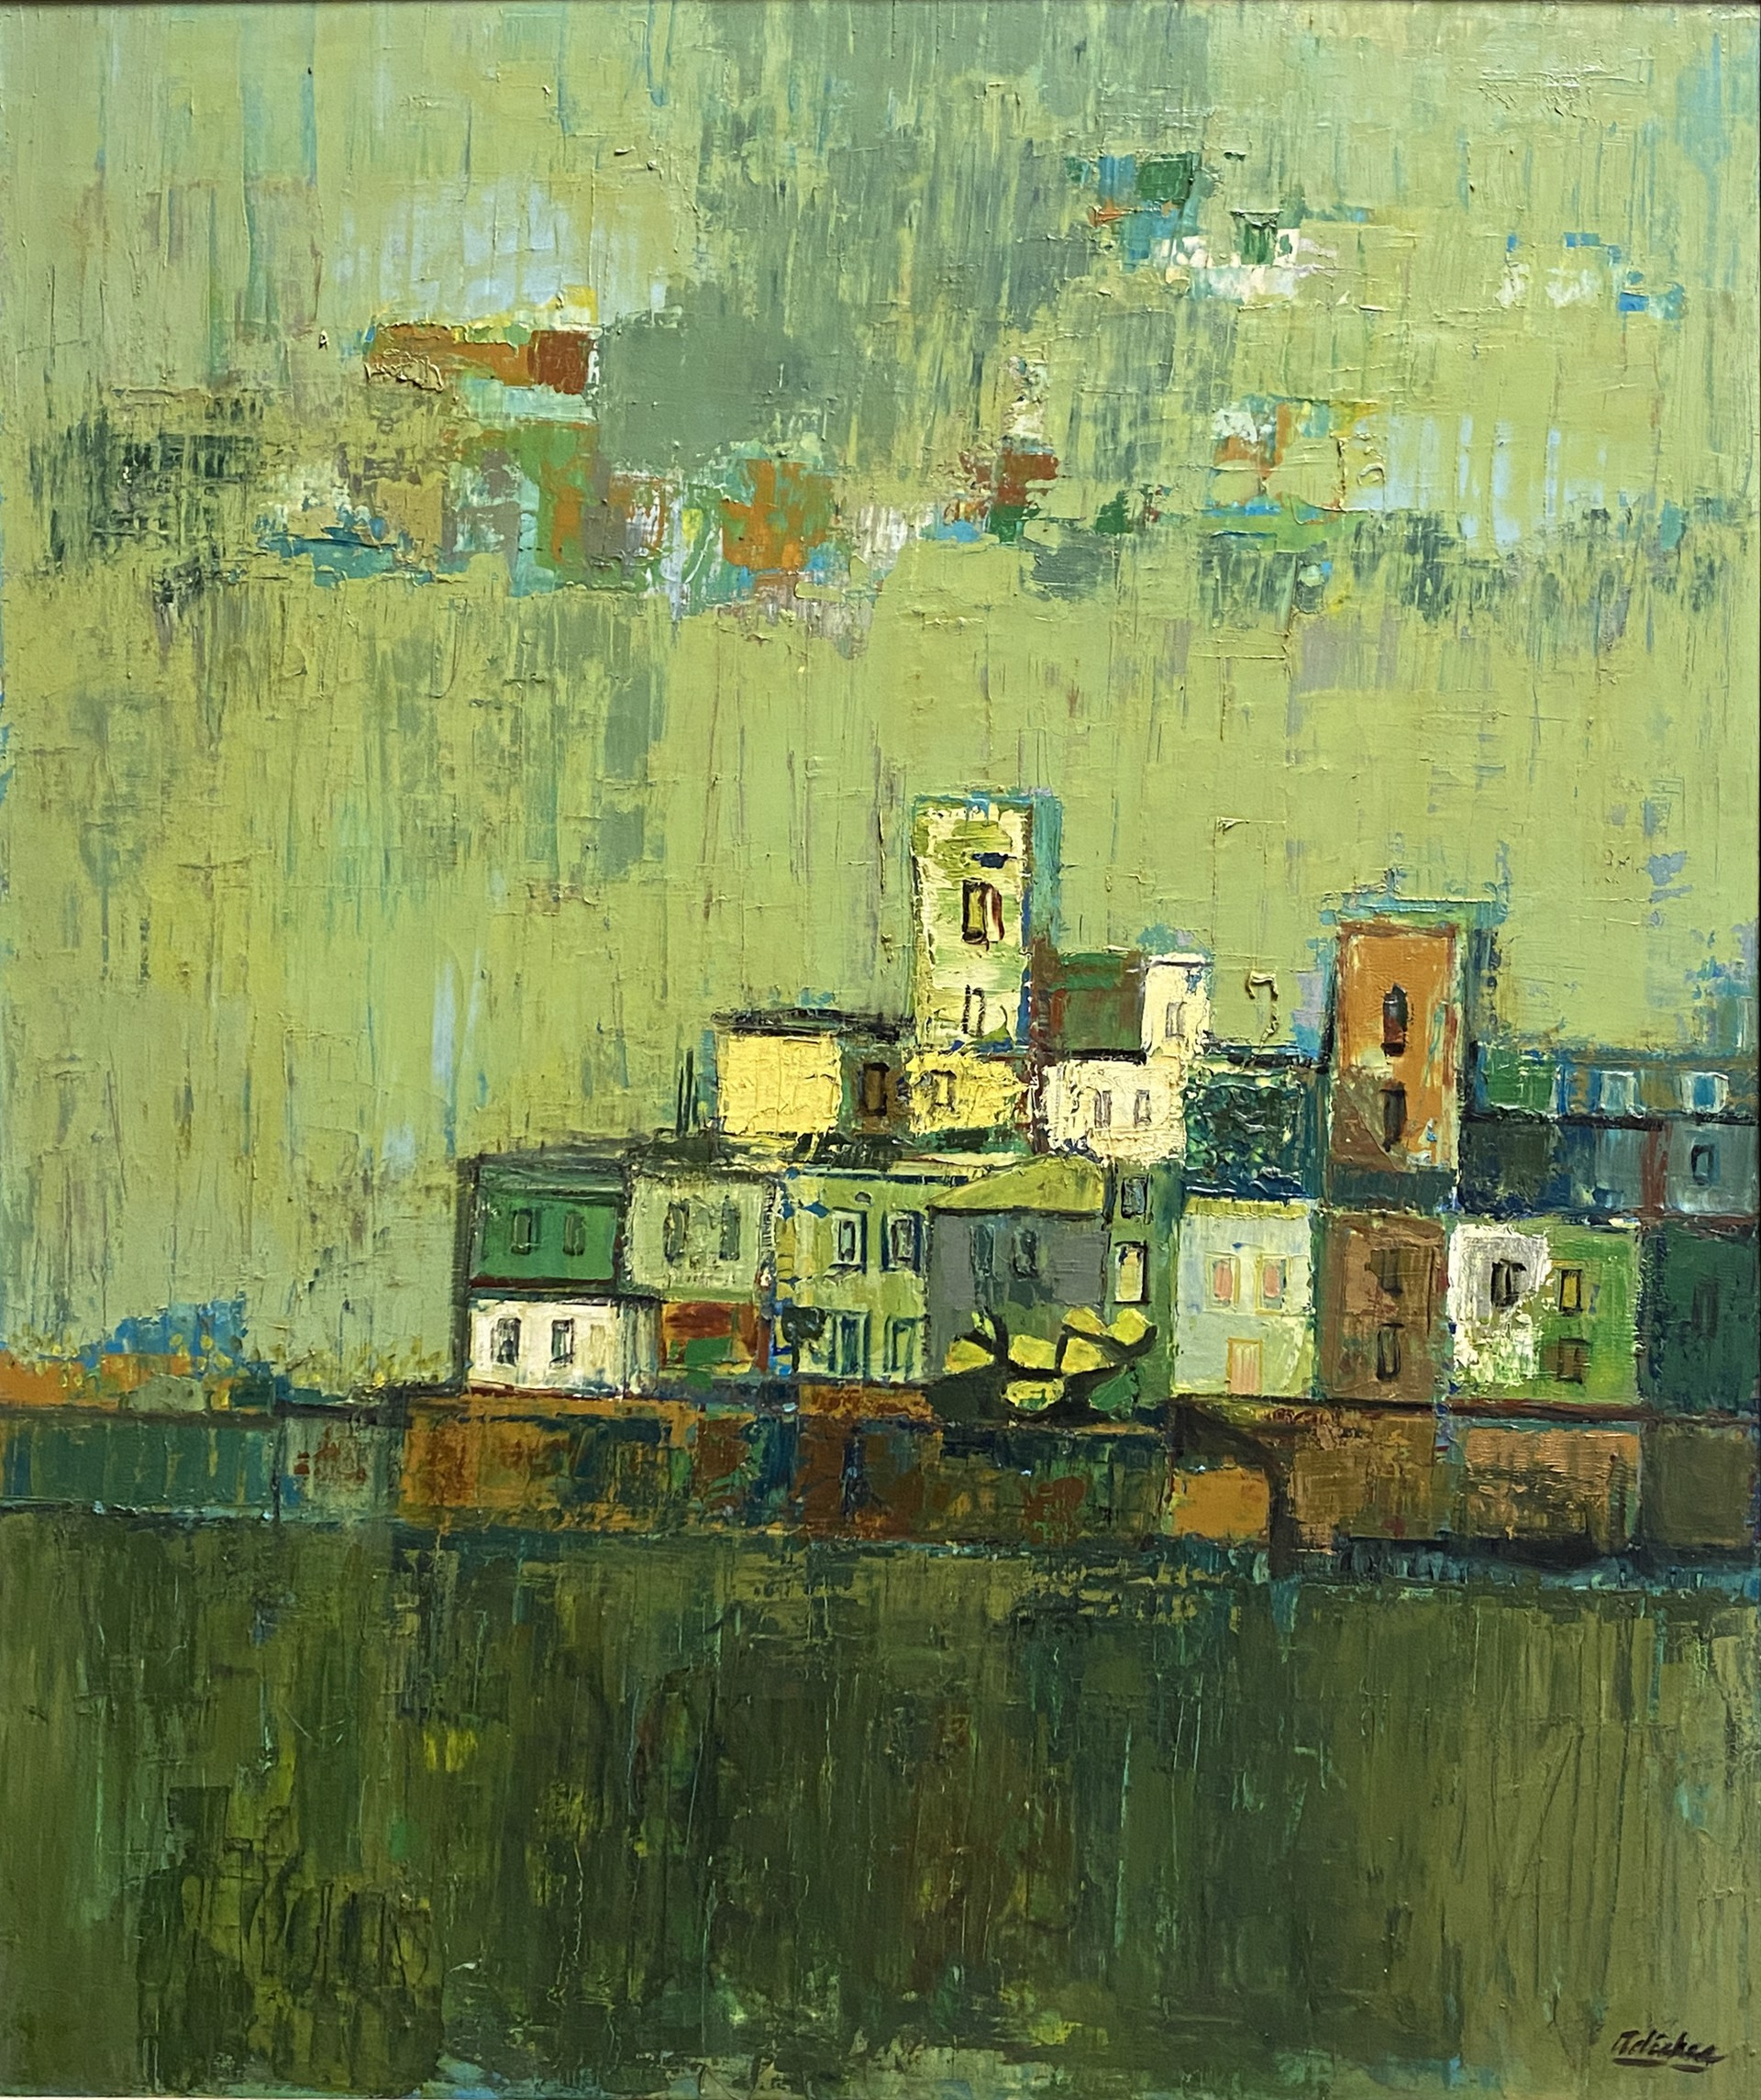 Untitled, Village at Sea by David Adickes